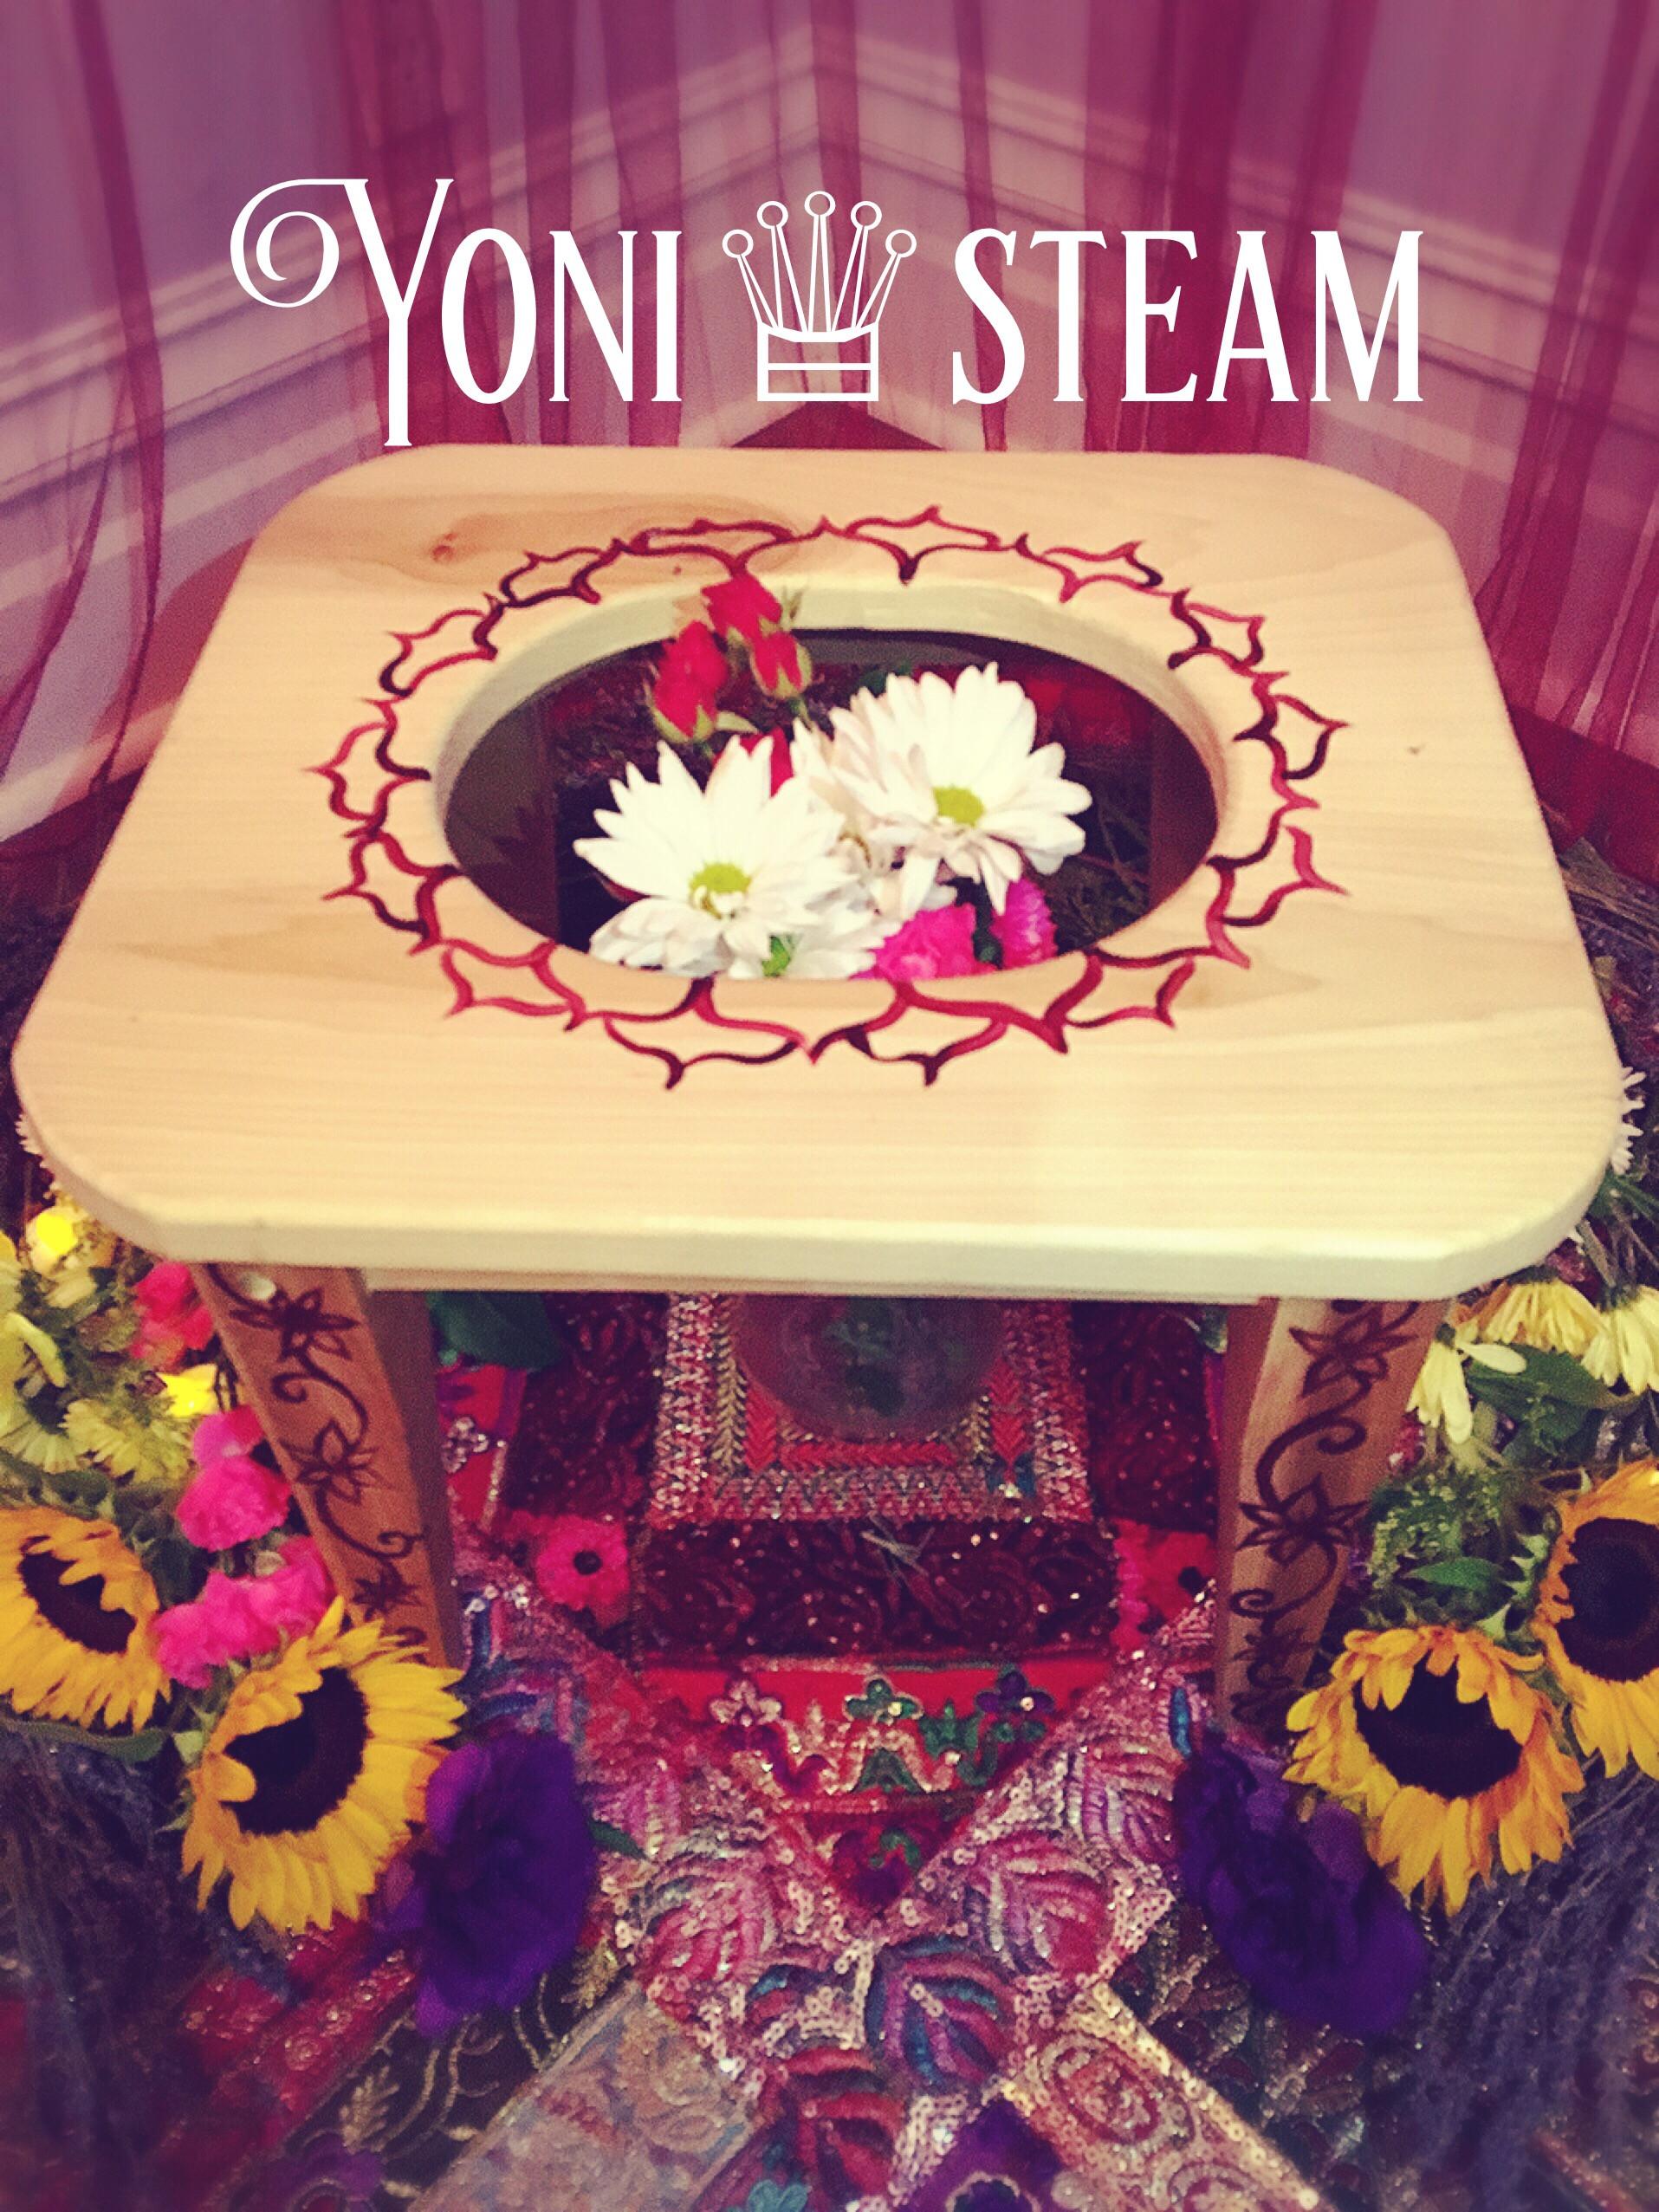 Vaginal Steam - ( Yoni Steam)